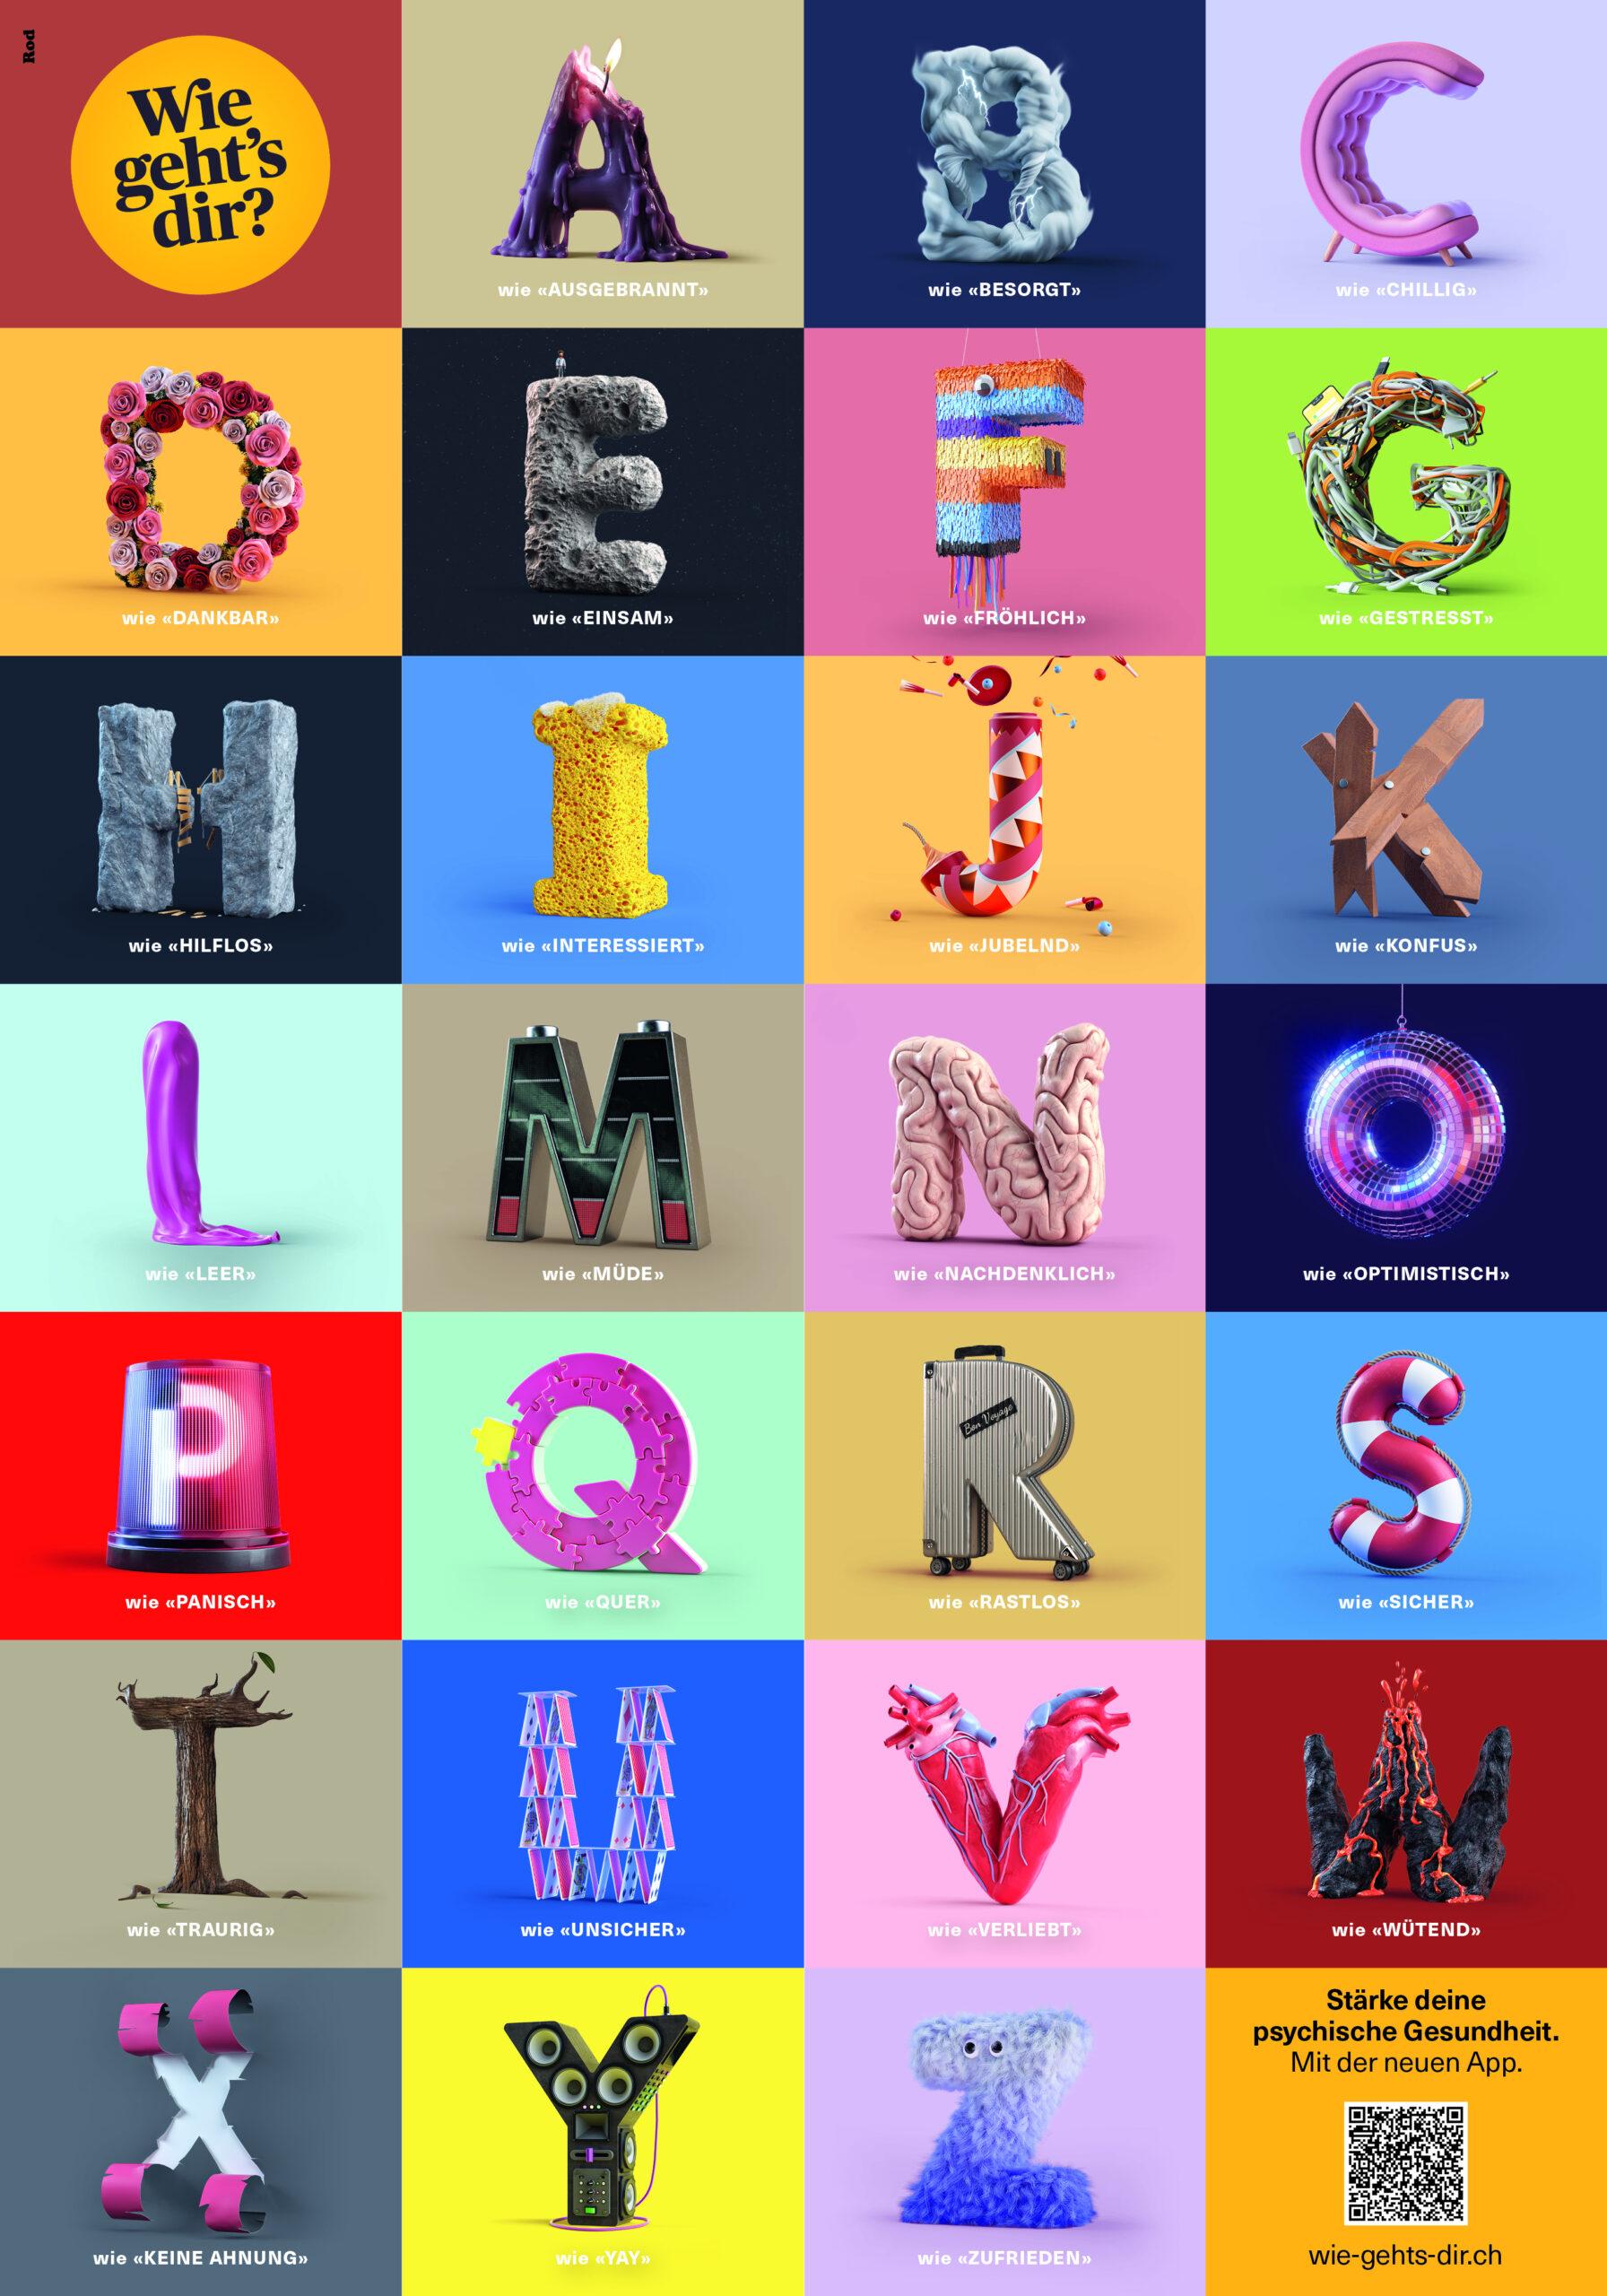 Plakat mit emotionalem Alphabet zur Kampagne